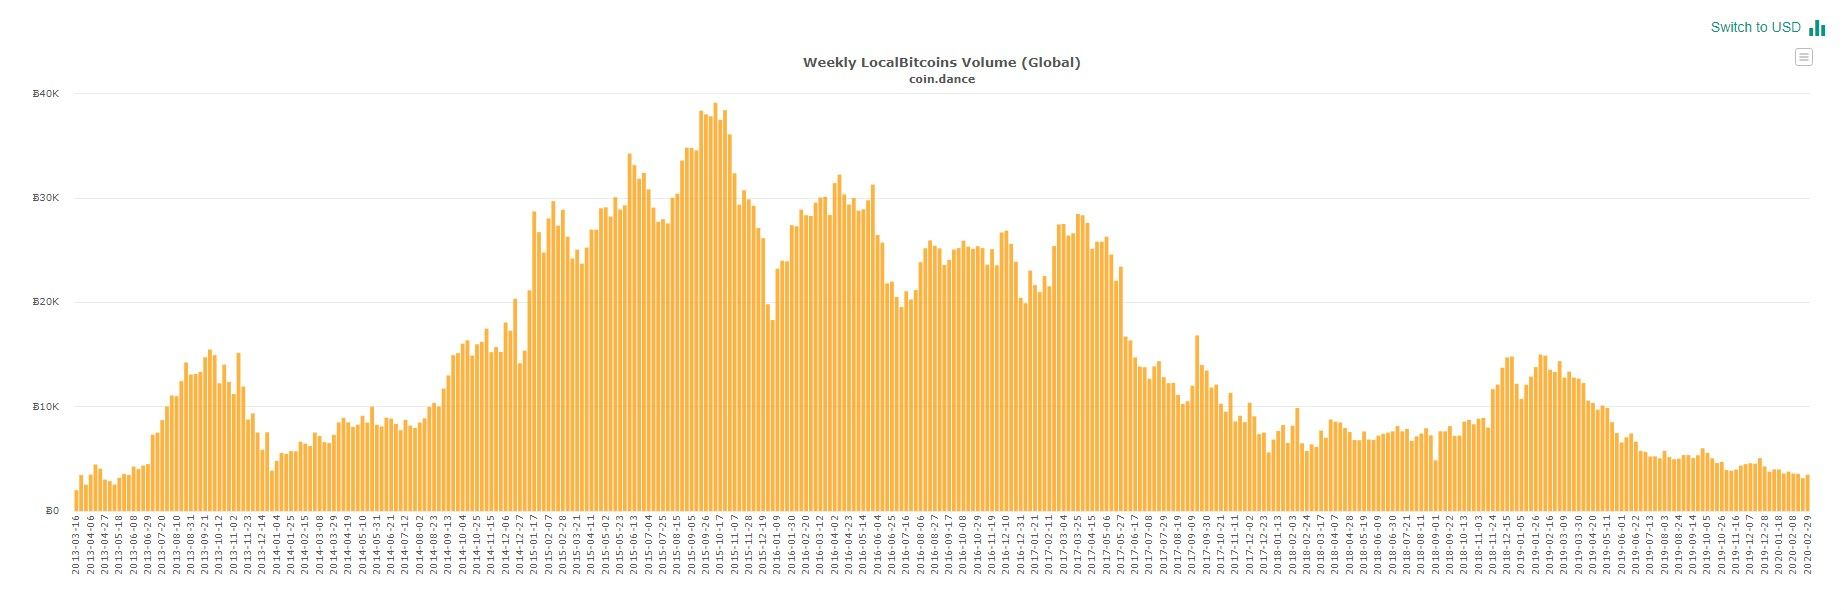 Объемы торгов на LocalBitcoins снизились до 7-летнего минимума